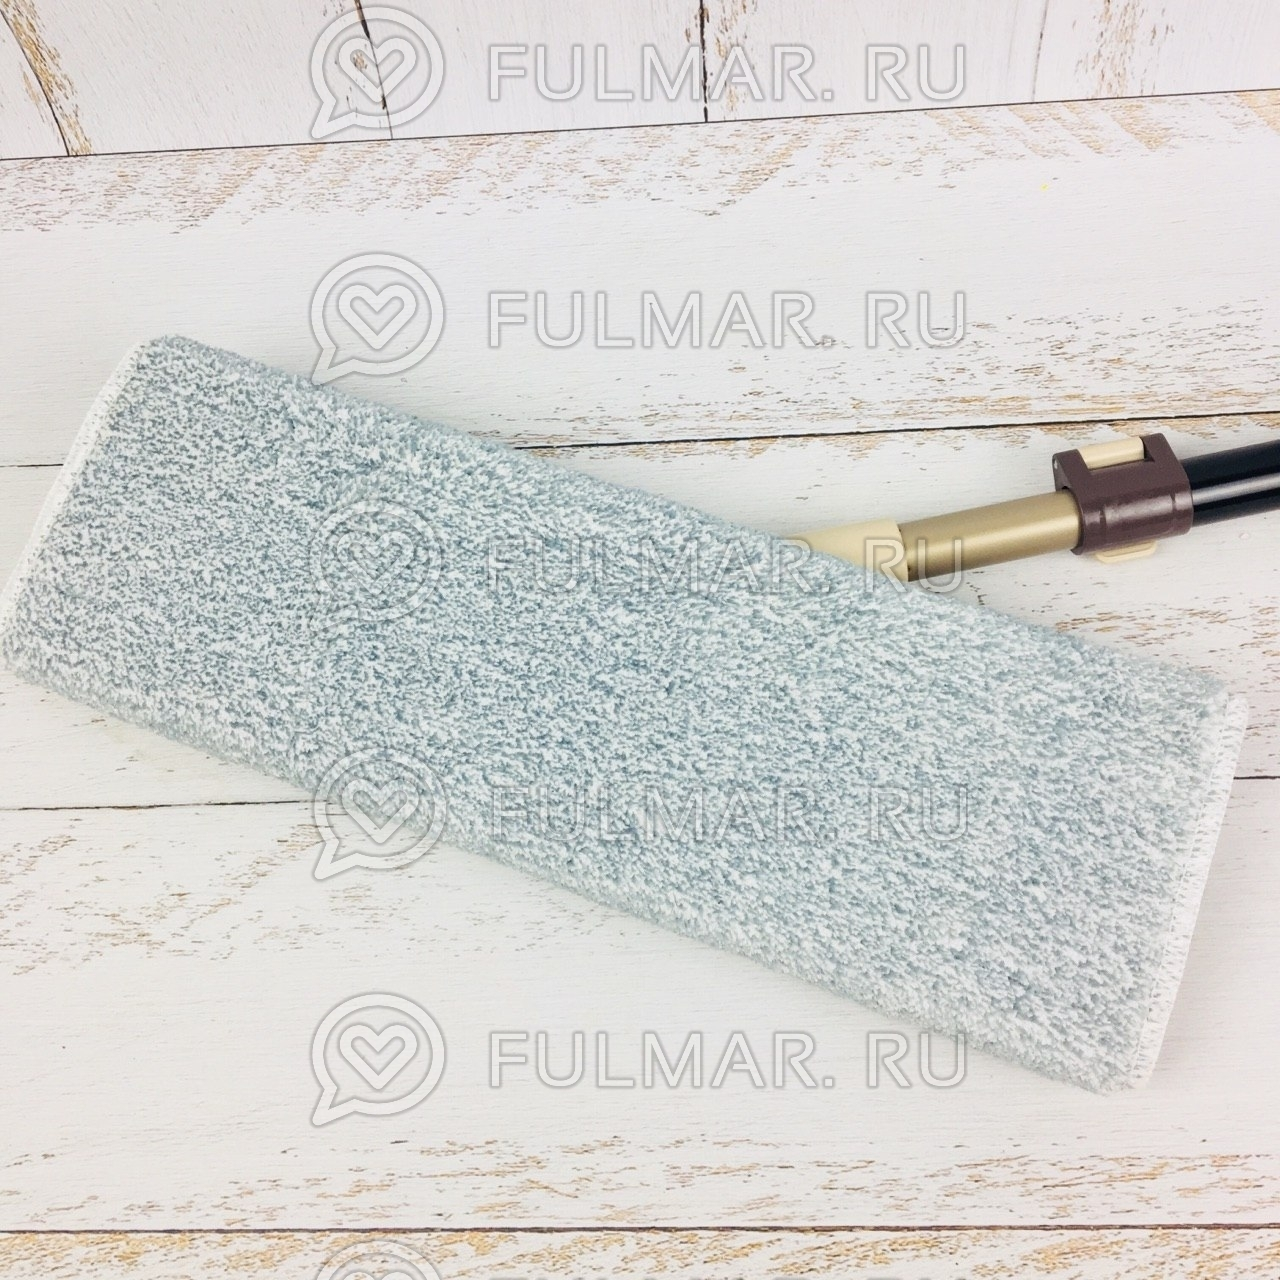 Сменная насадка для швабры Boomjoy Dry Wet Flat Mop Серая